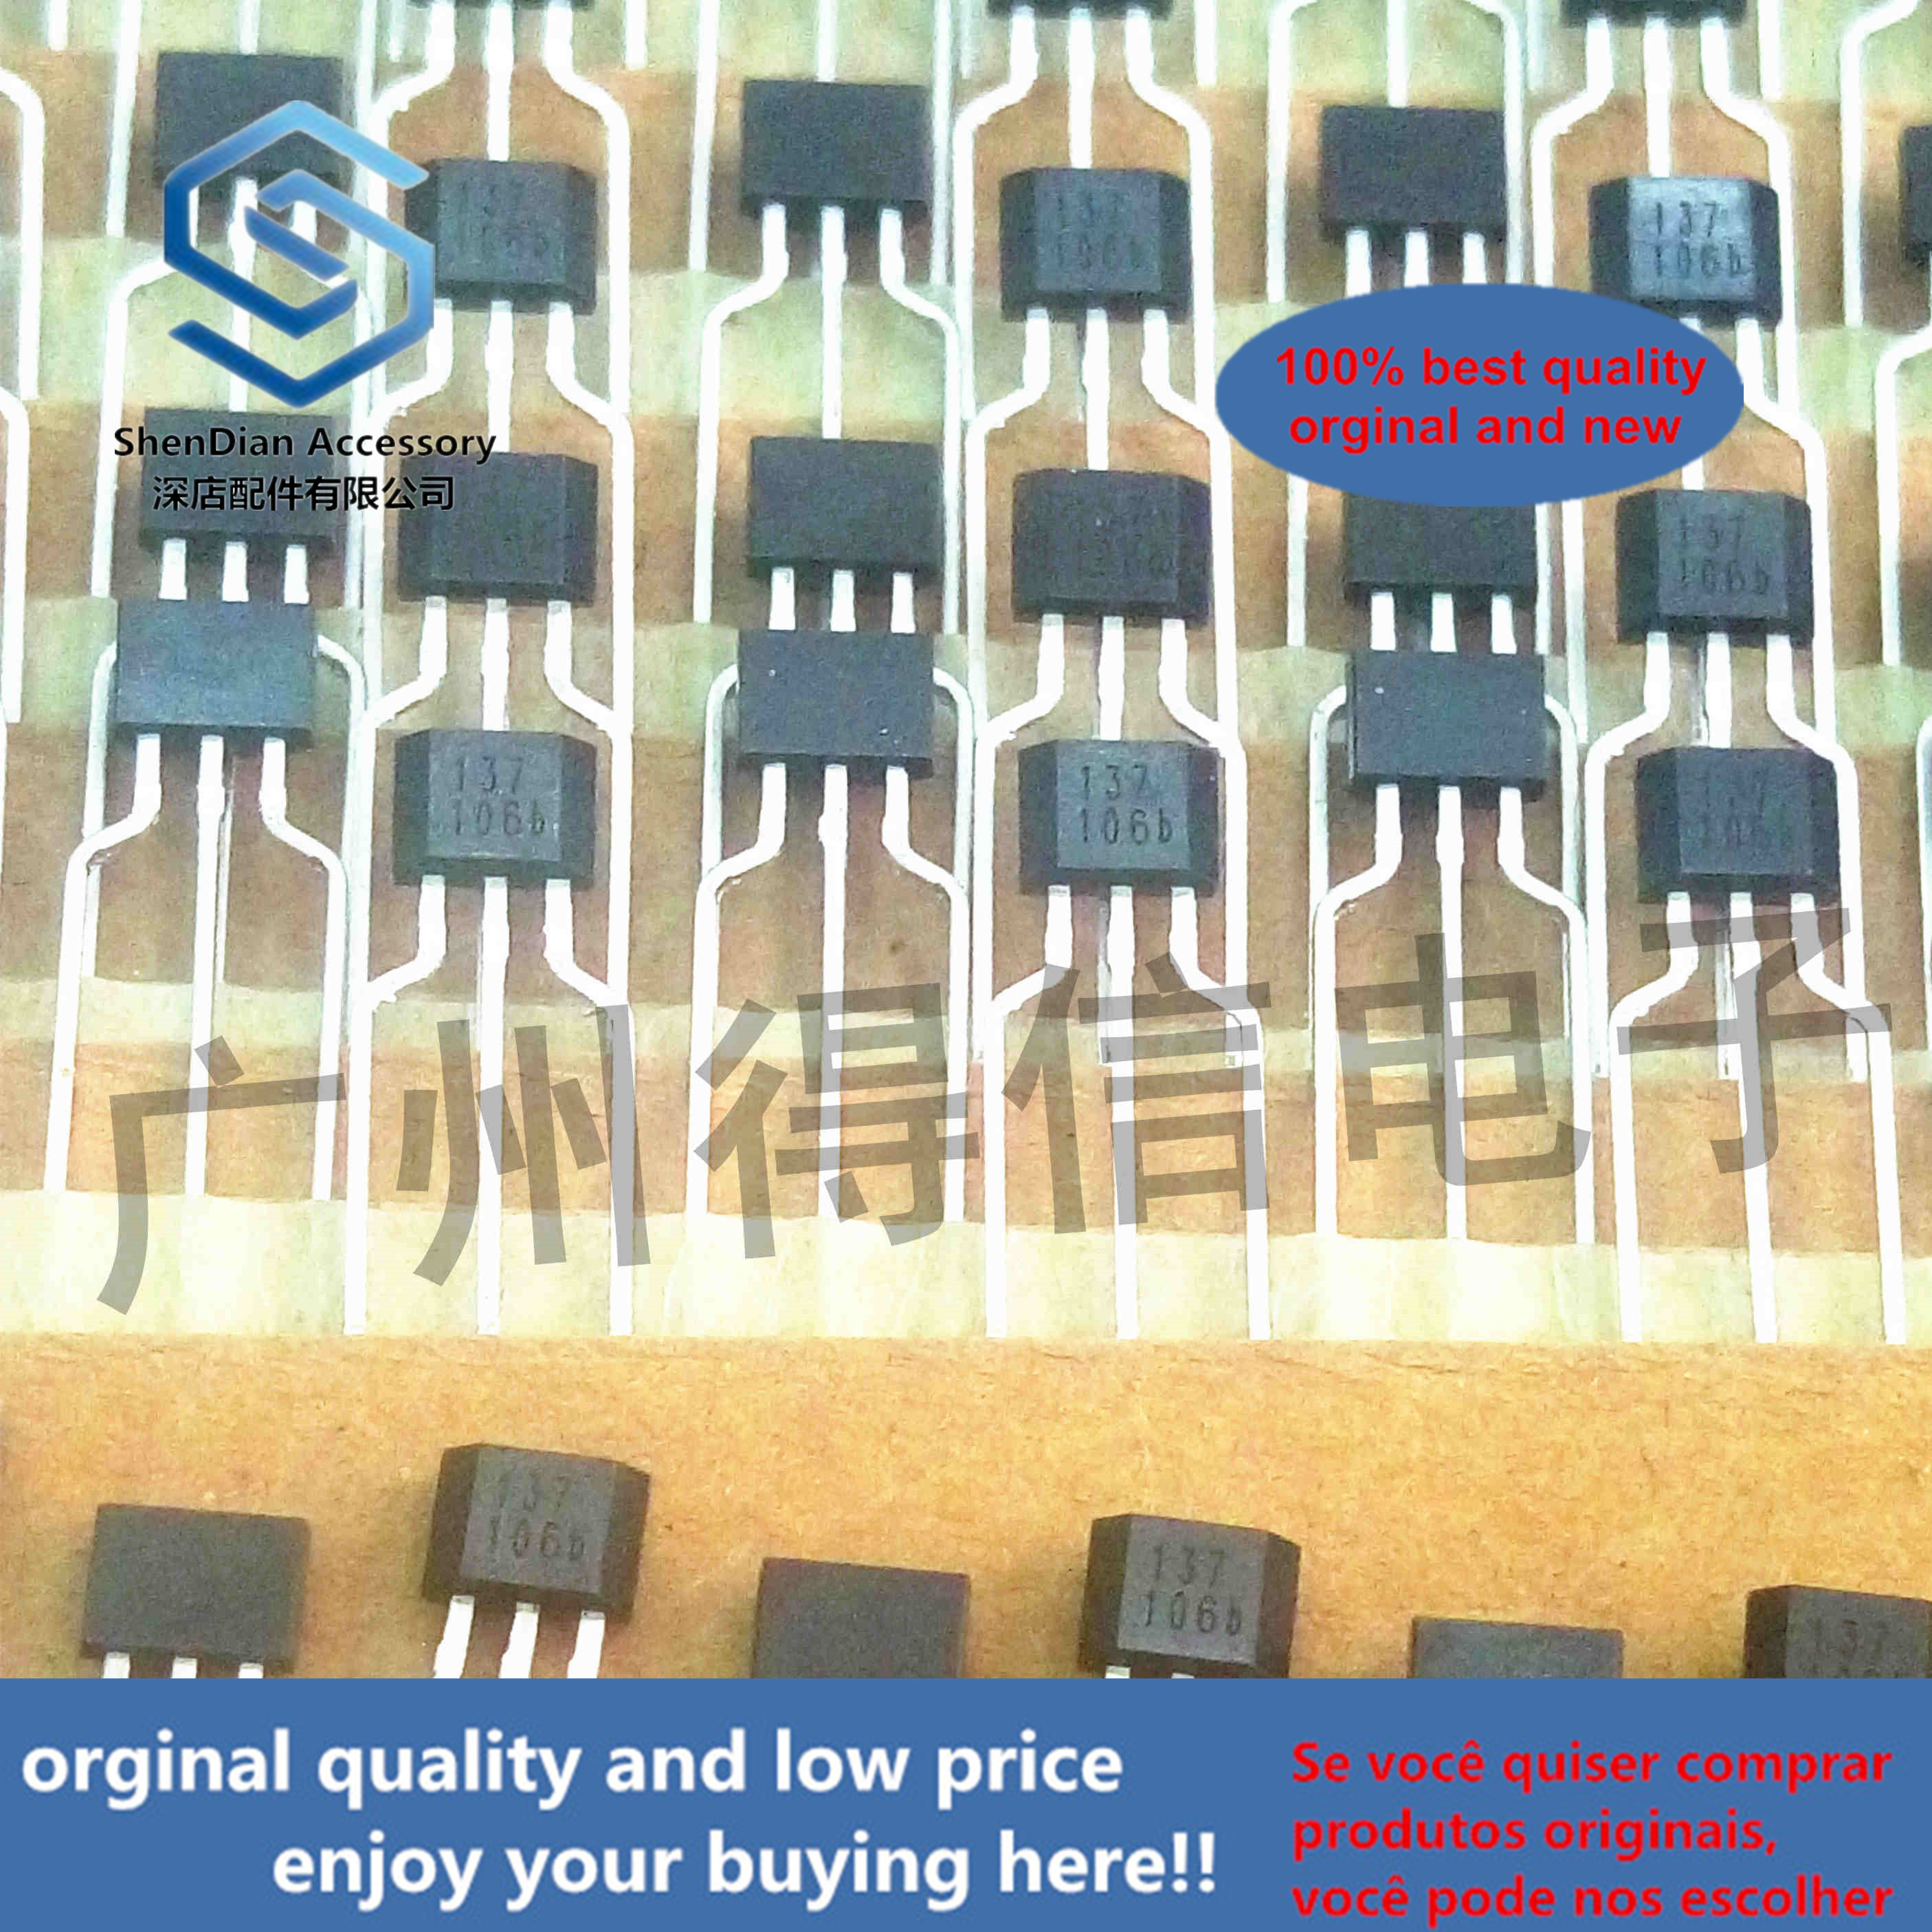 10pcs 100% Orginal New ATS137 137 SINGLE HALL EFFECT SWITCH Real Photo